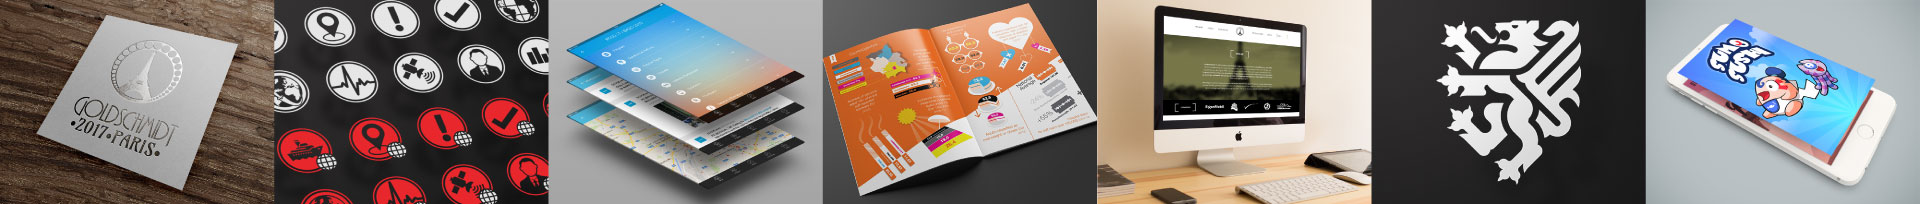 Cambridge graphic design, illustration and logo design